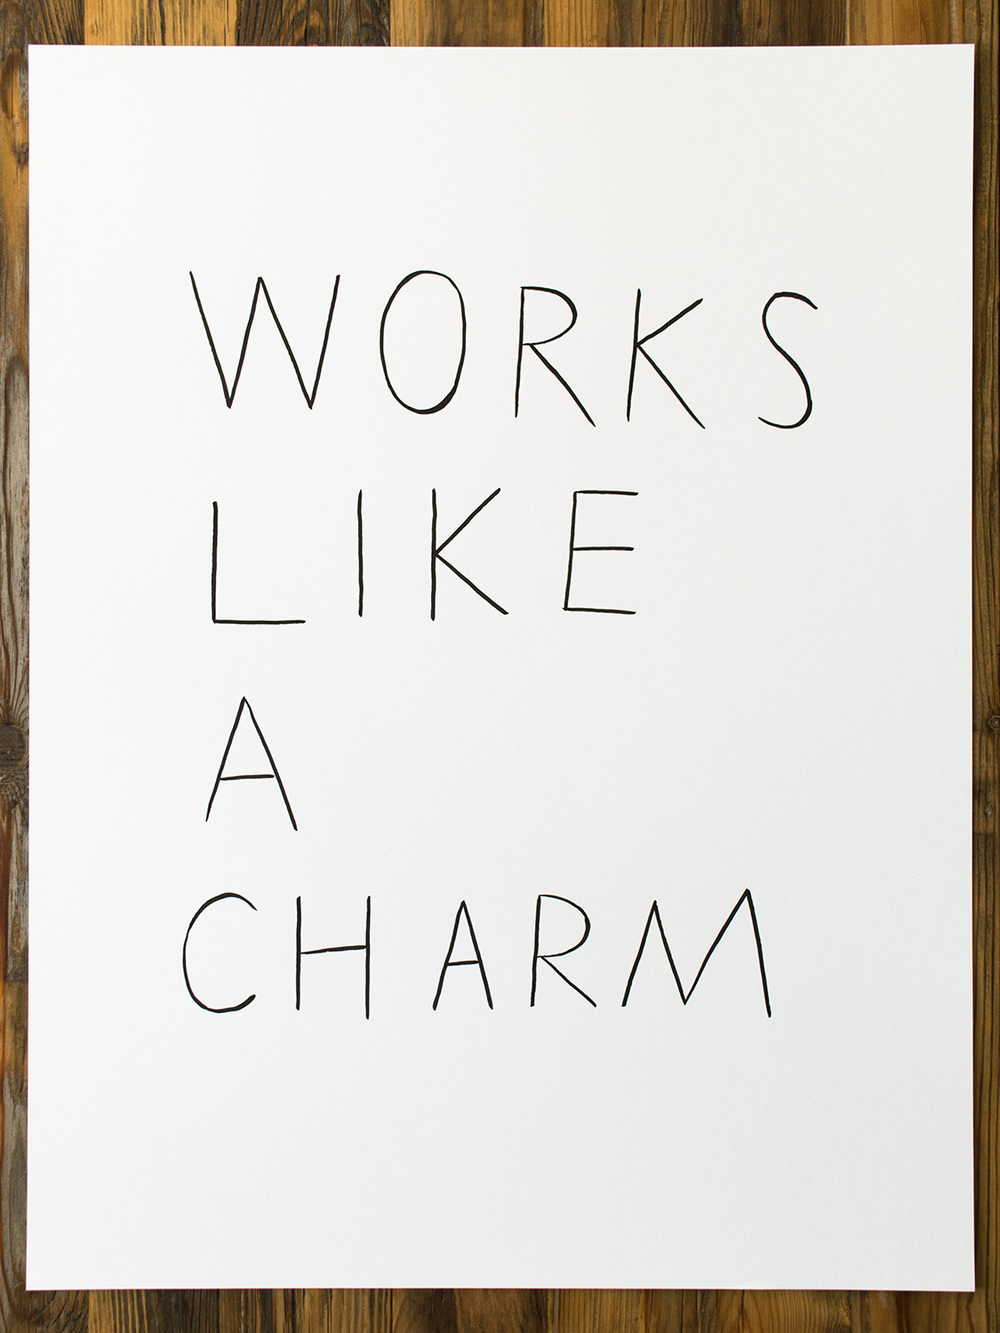 works_like_a_charm-1500x1125.jpg